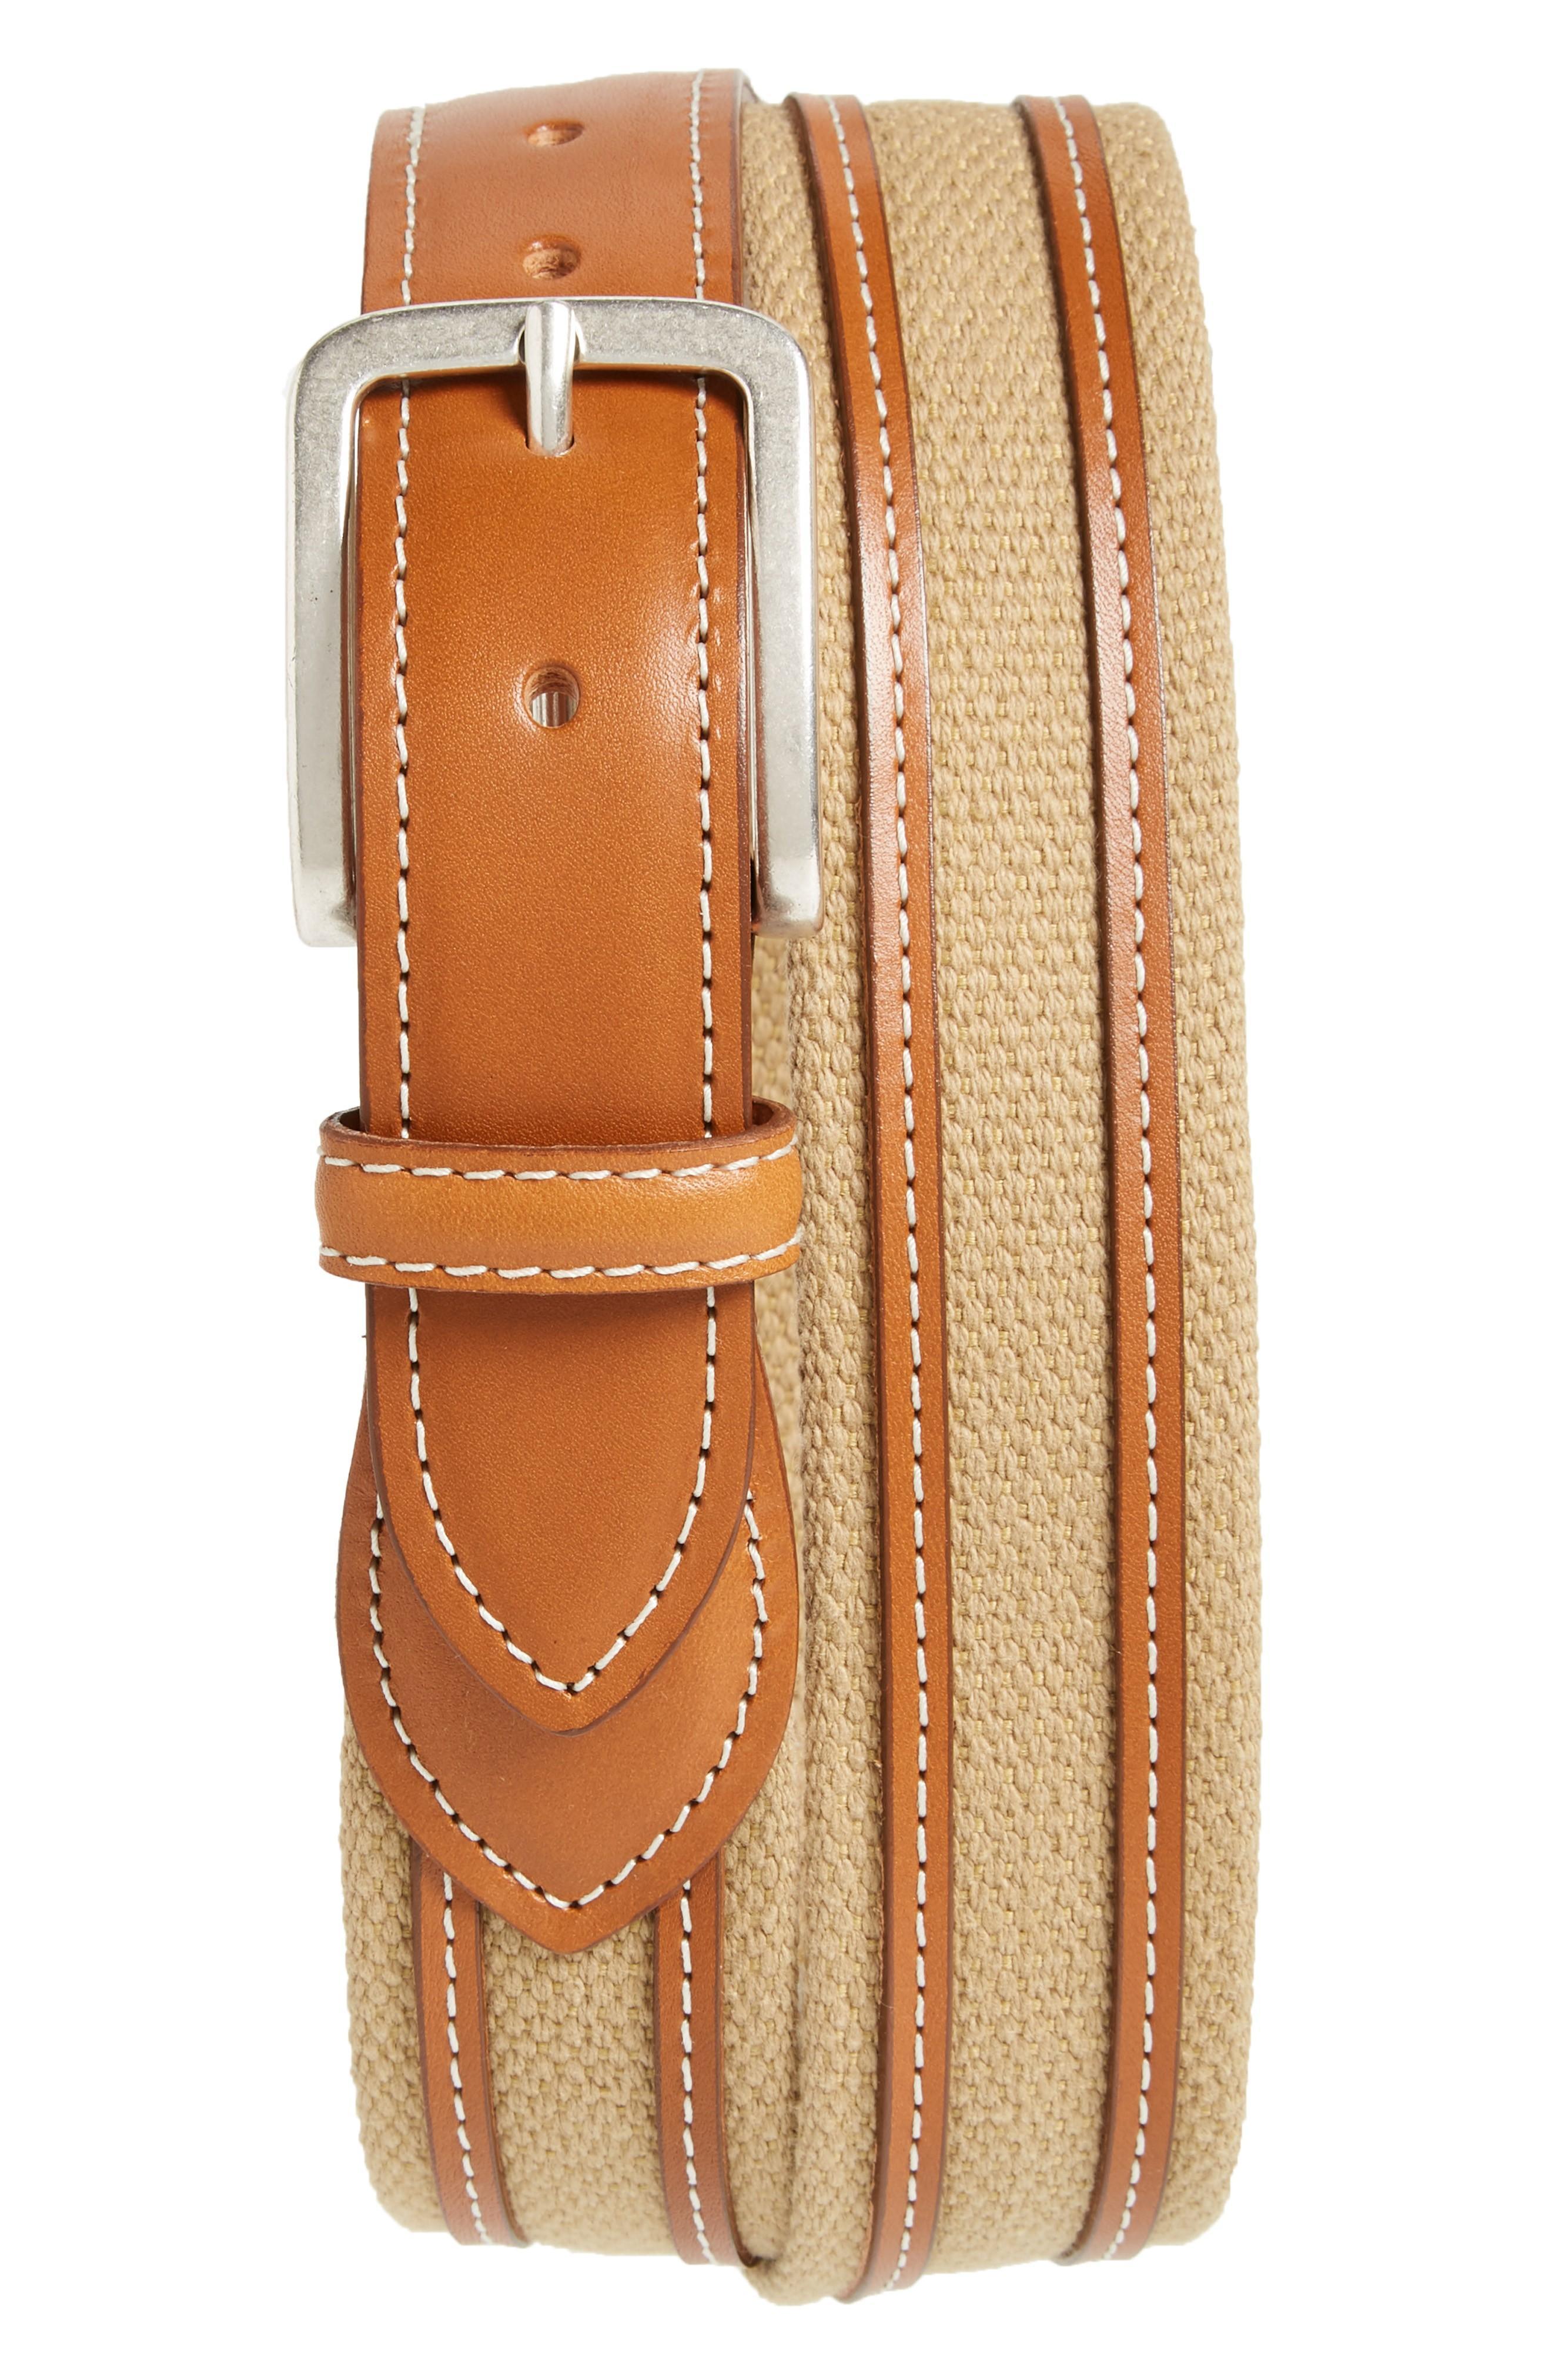 Allen Edmonds Canvas Strap Belt In Khaki/ Walnut